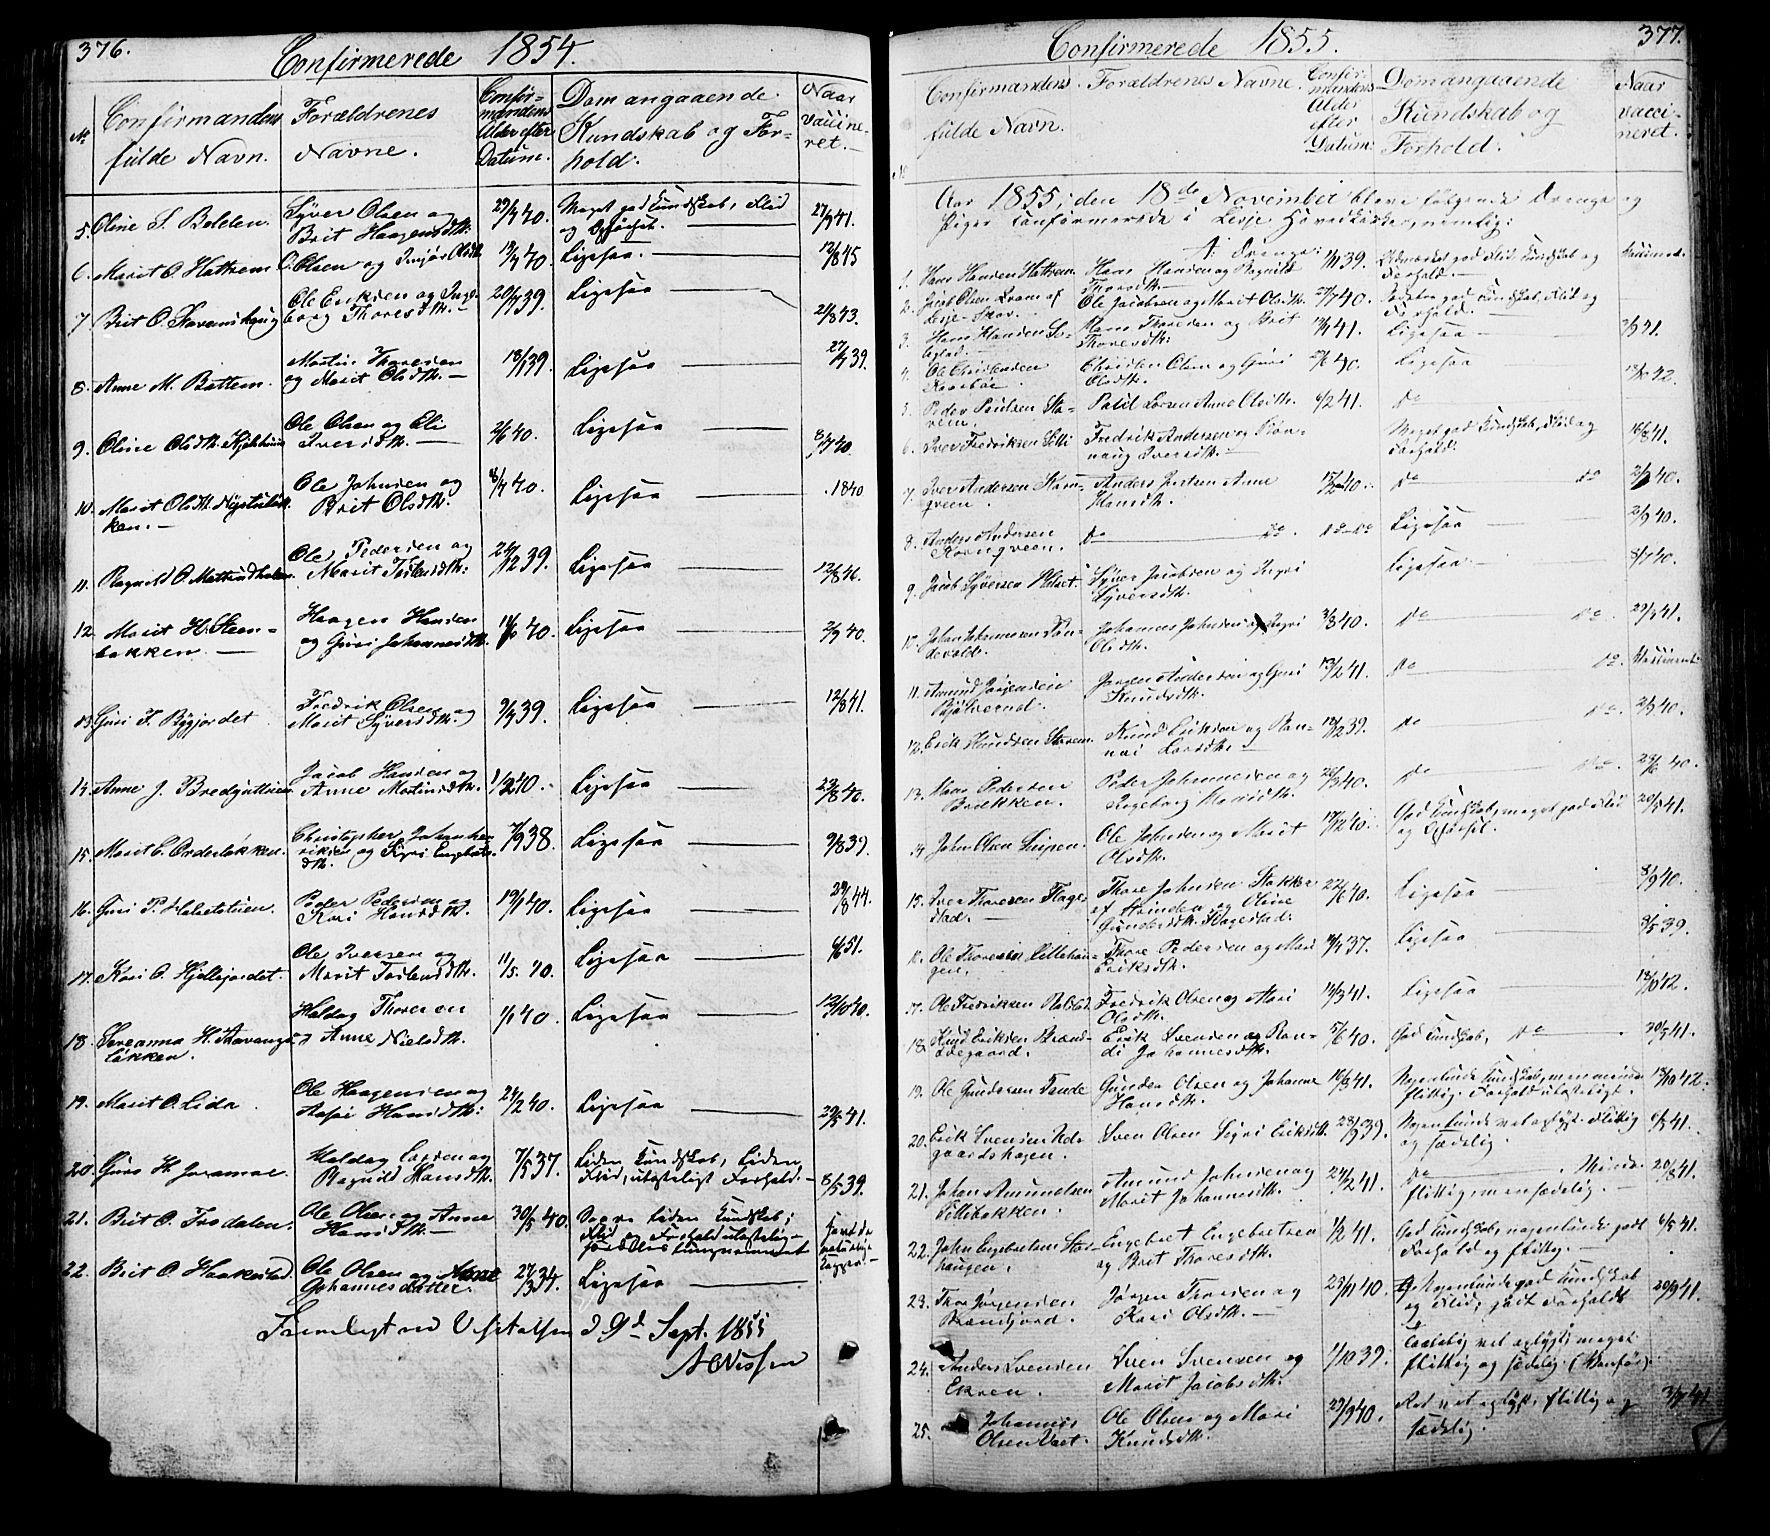 SAH, Lesja prestekontor, Klokkerbok nr. 5, 1850-1894, s. 376-377